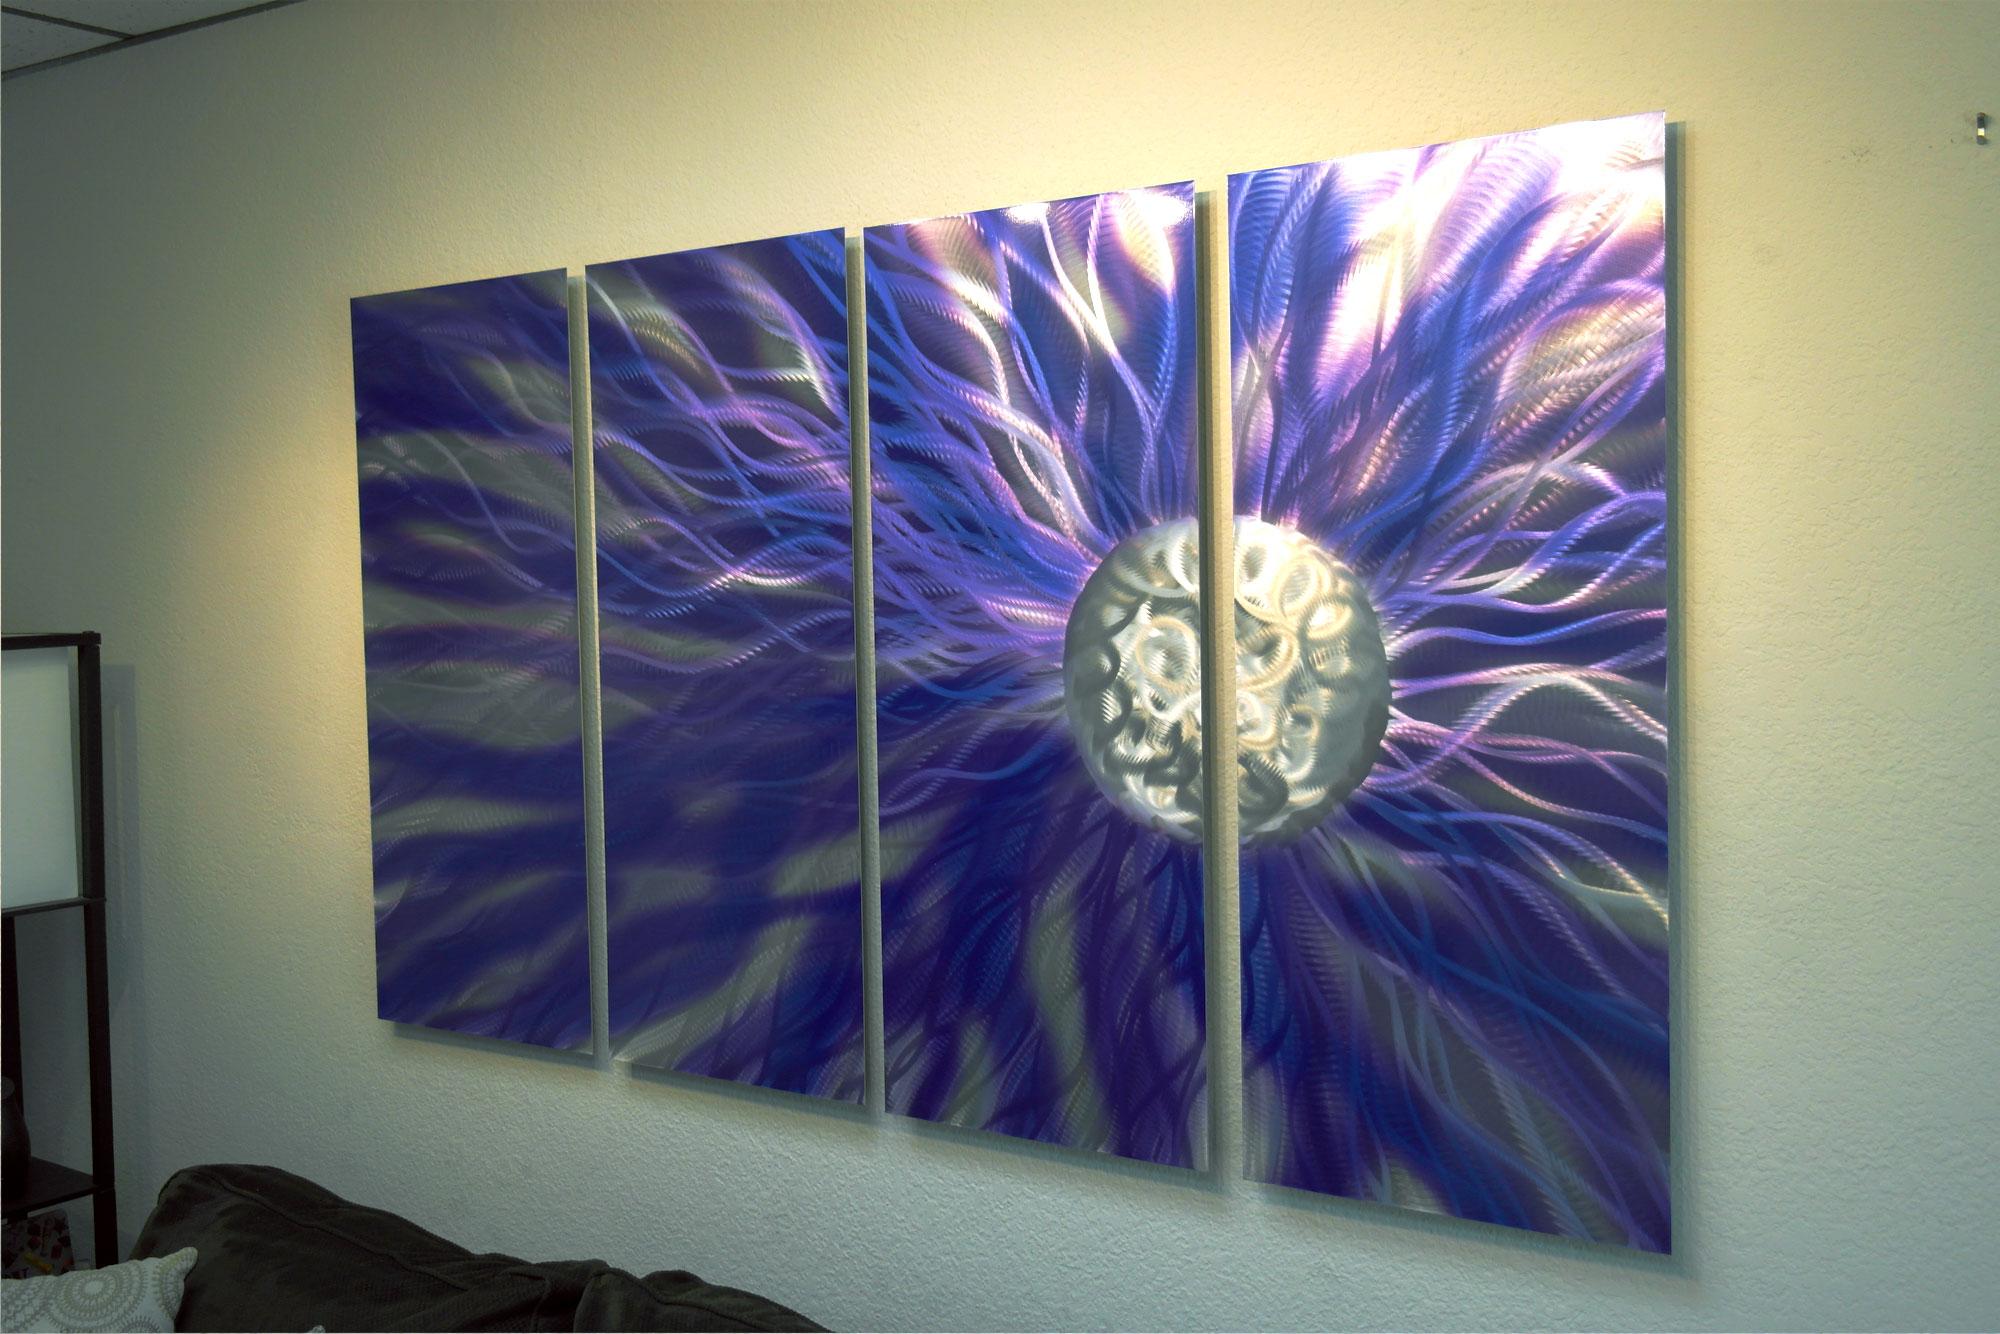 solare purple 36x63 abstract metal wall art contemporary modern decor inspiring art gallery. Black Bedroom Furniture Sets. Home Design Ideas